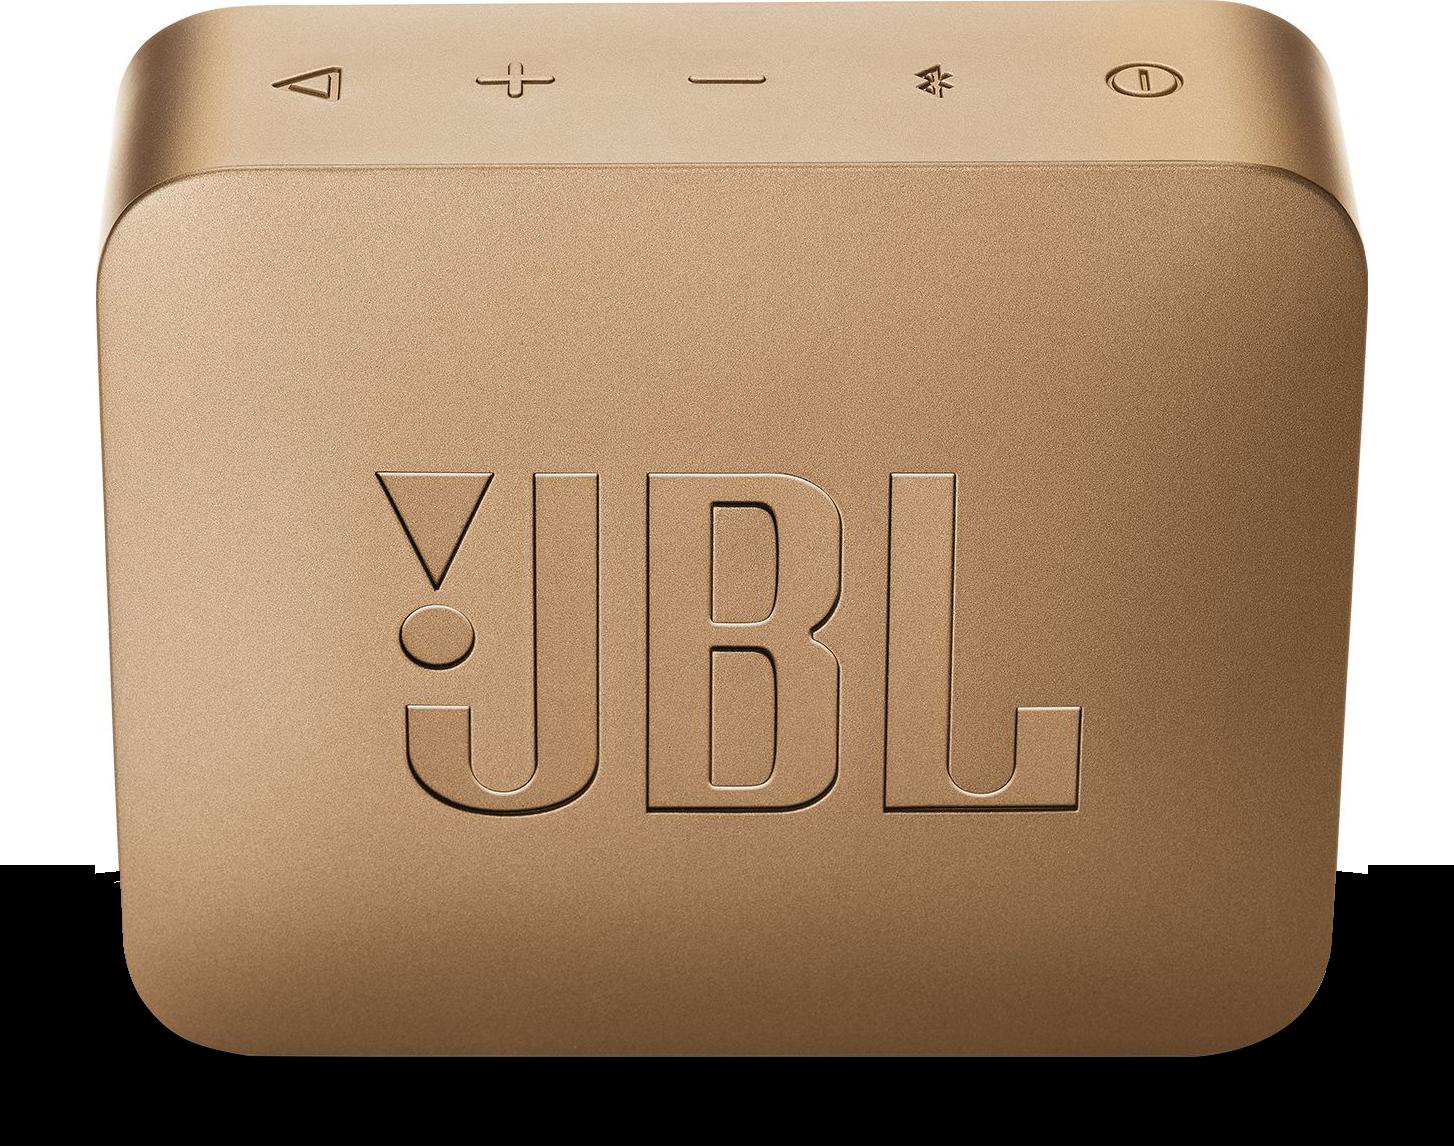 RE2FSgp?ver=0cb1 - JBL GO 2 Portable Bluetooth Speaker